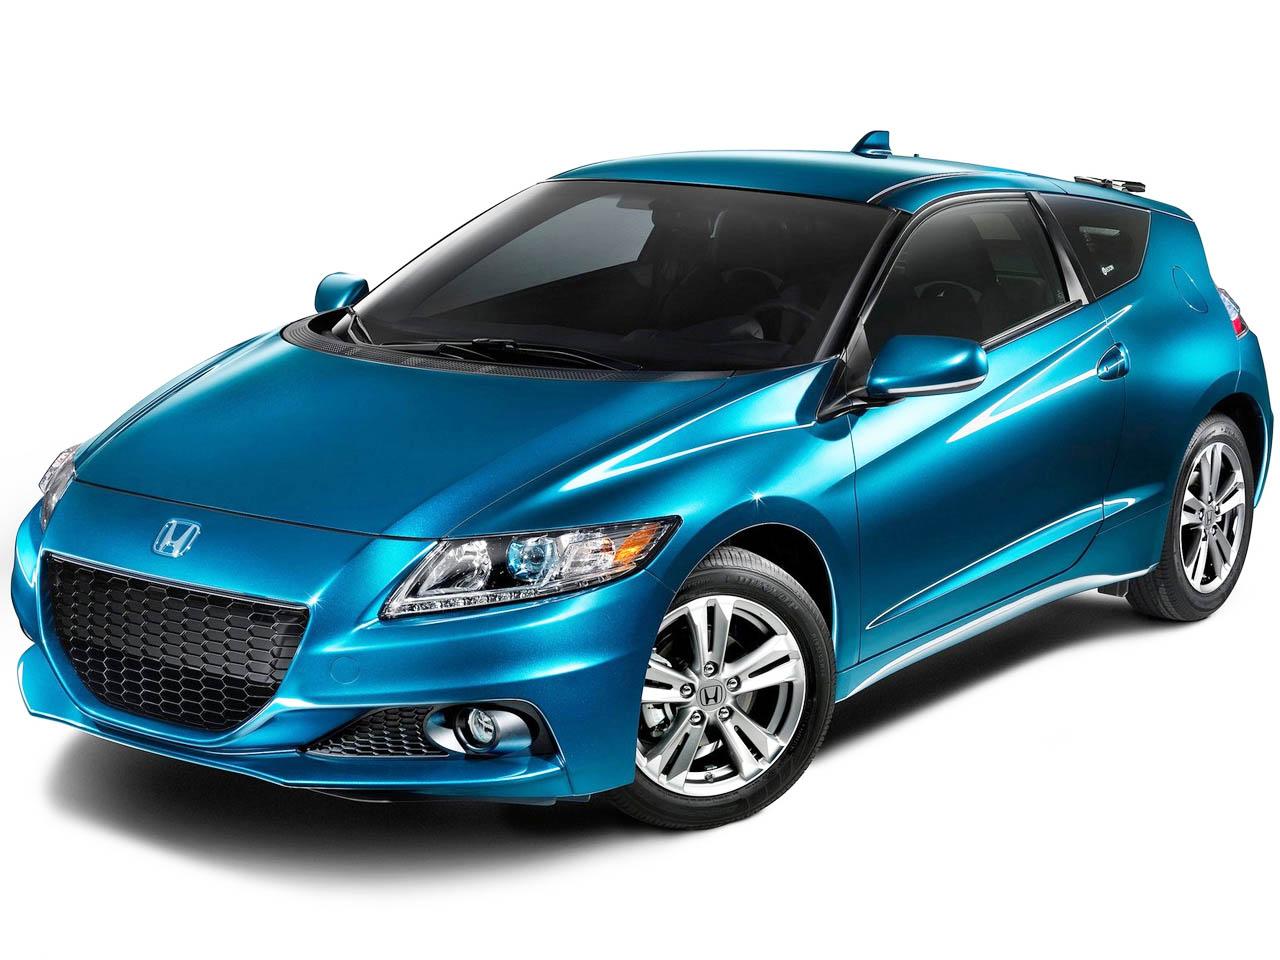 Honda Cr Z Smart Car Manufacured By